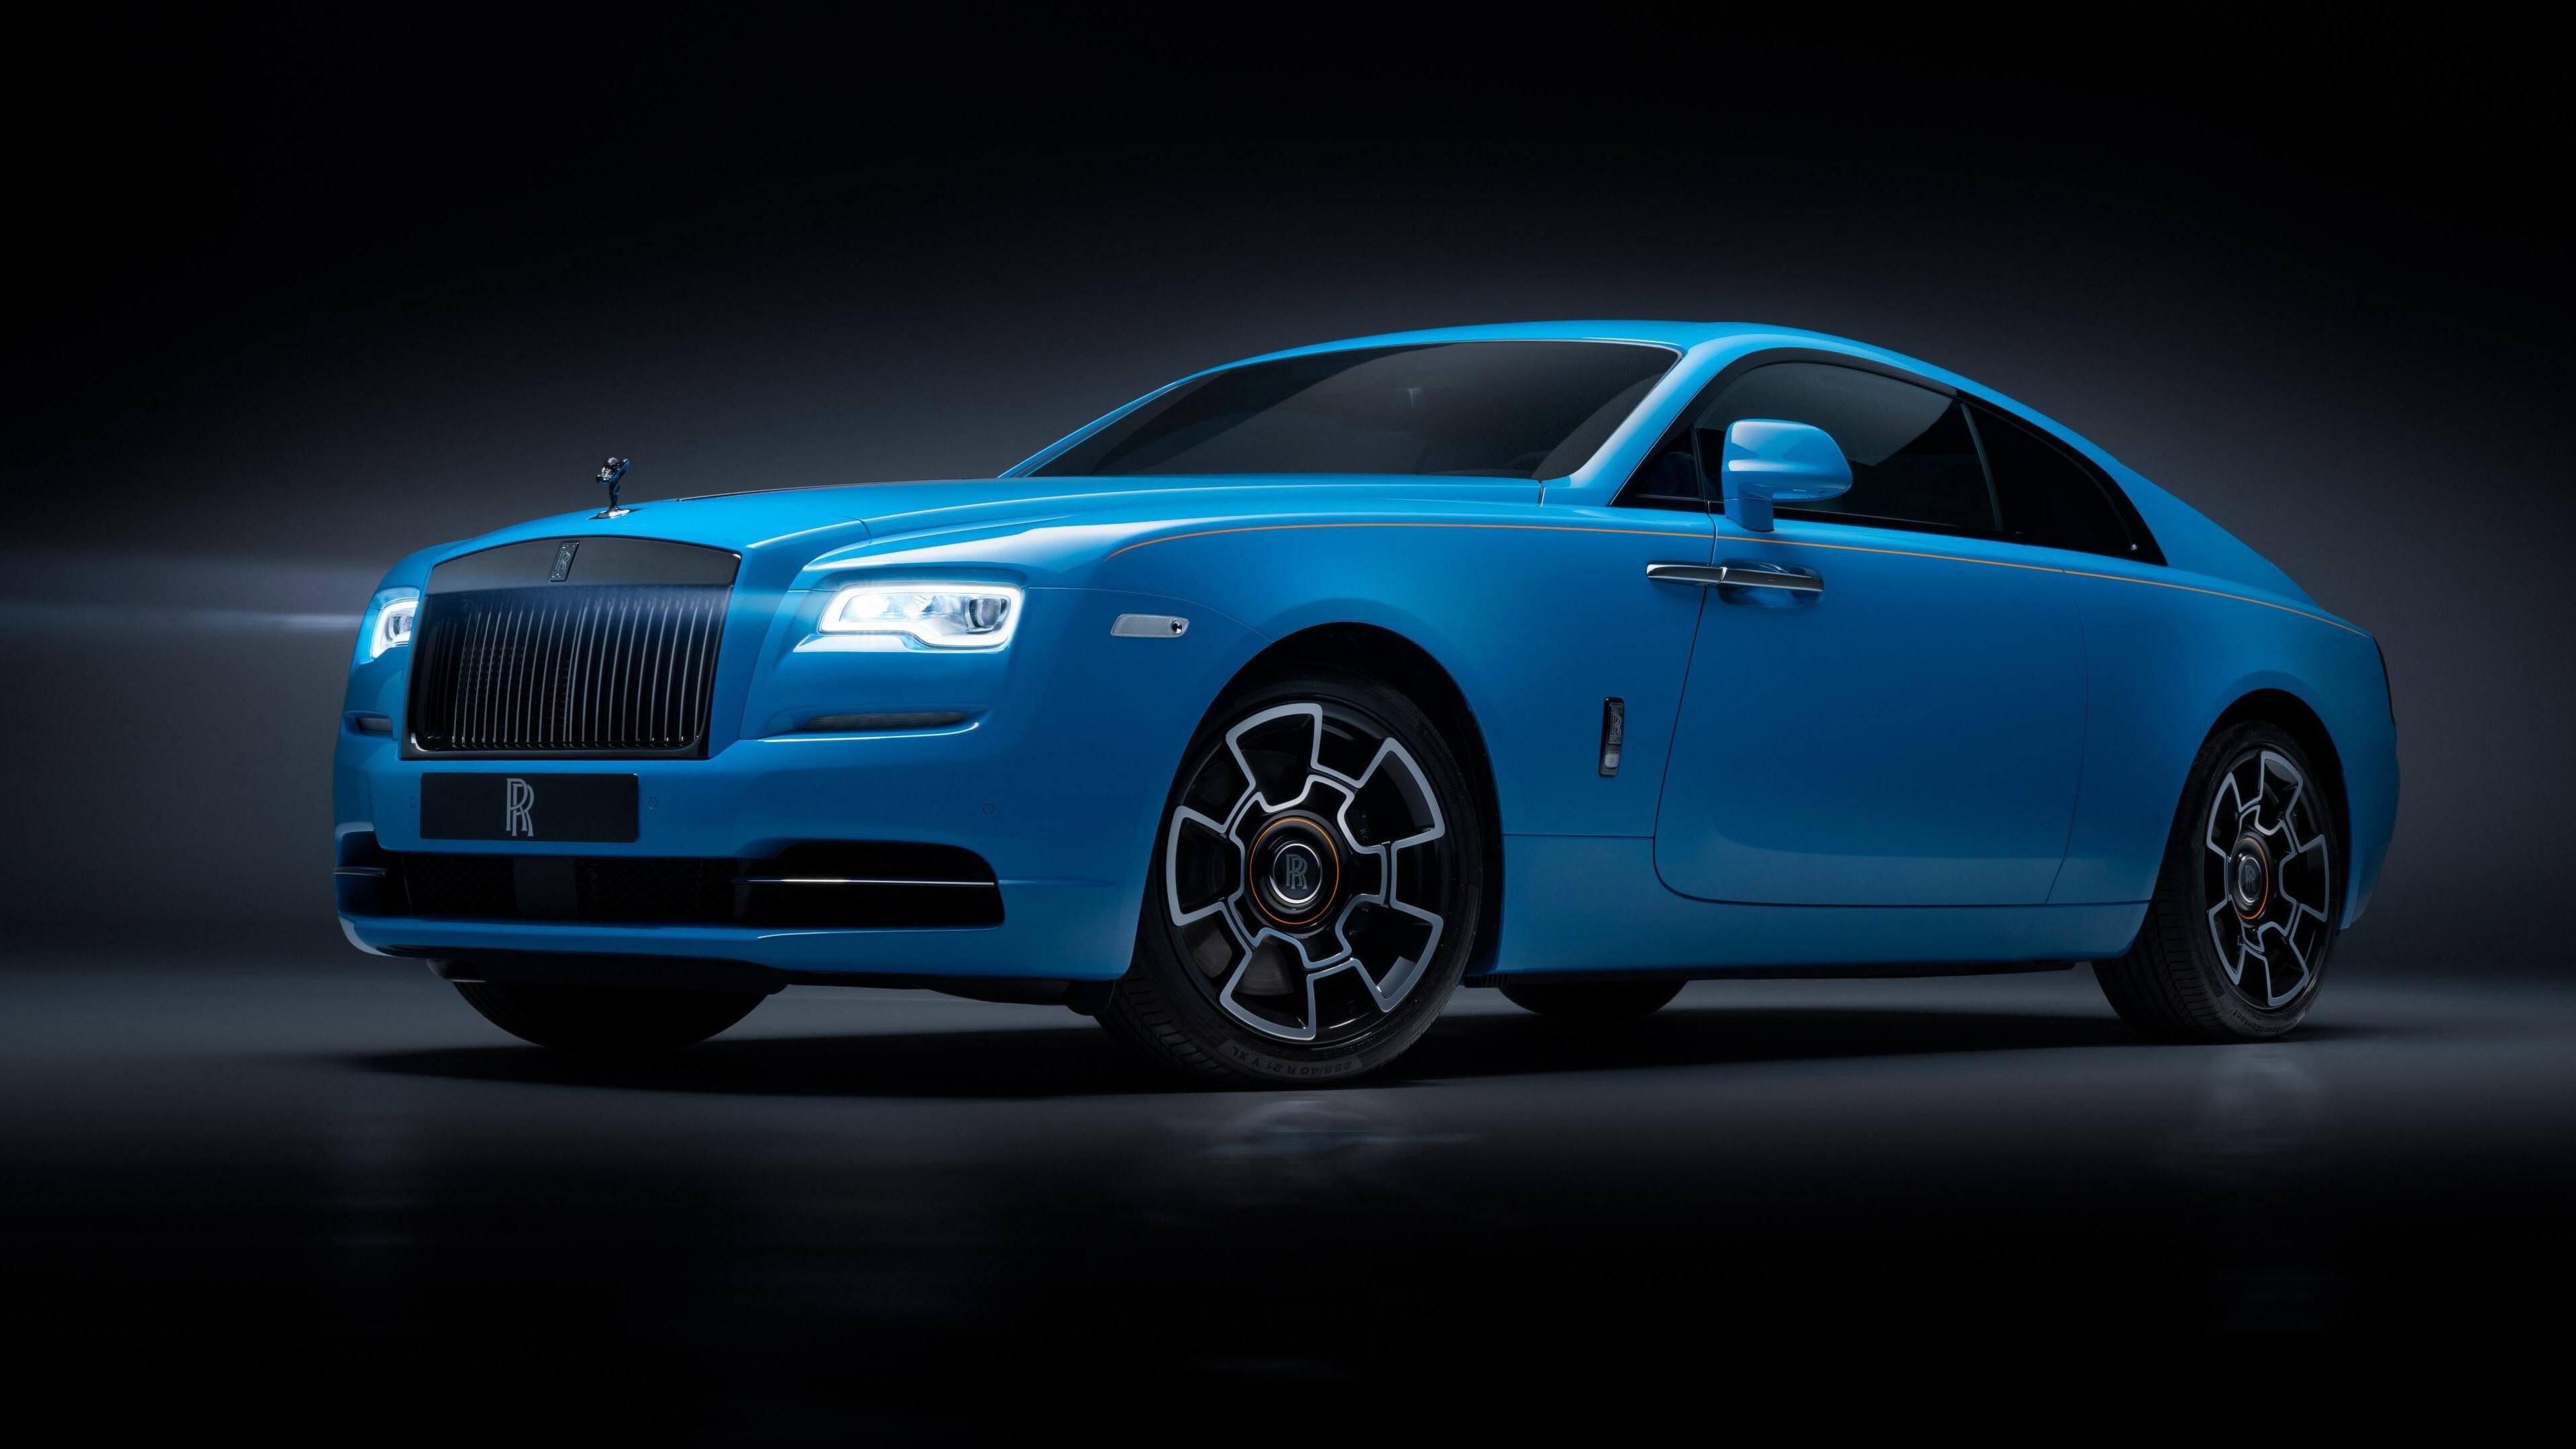 4k Photo Of 2019 Rolls Royce Wraith Black Badge Car Hd